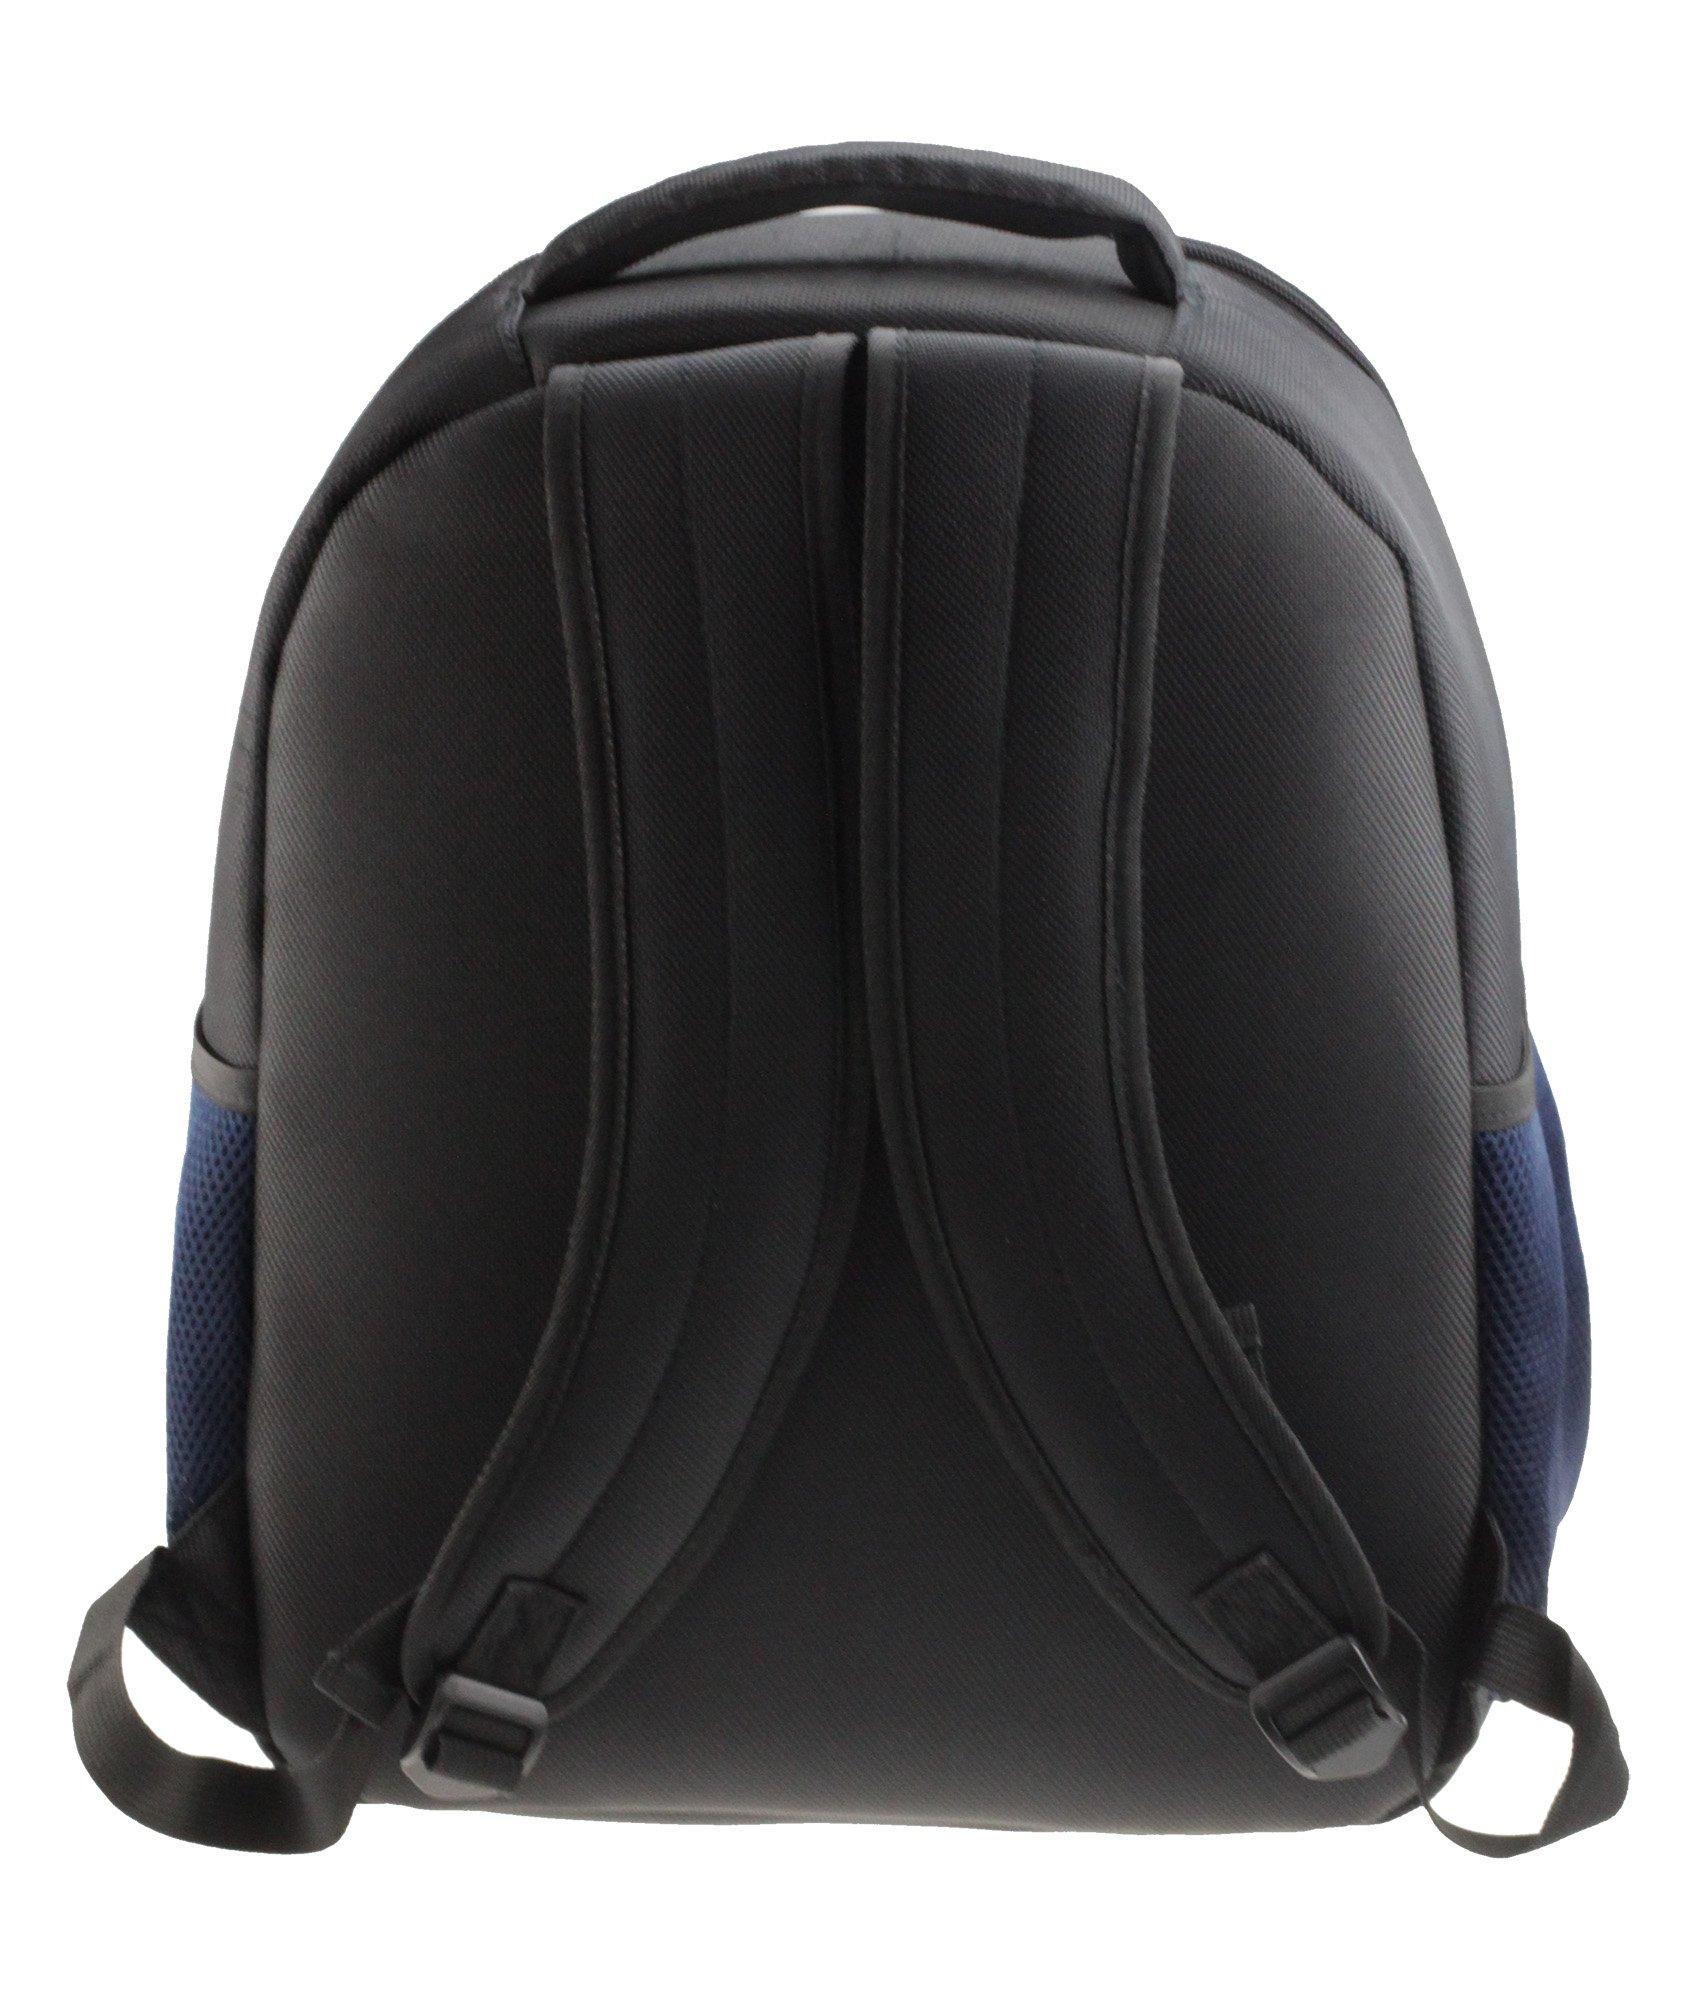 Navitech Rugged Black Backpack/Rucksack for The Oculus Rift + Oculus Touch Controller by Navitech (Image #4)